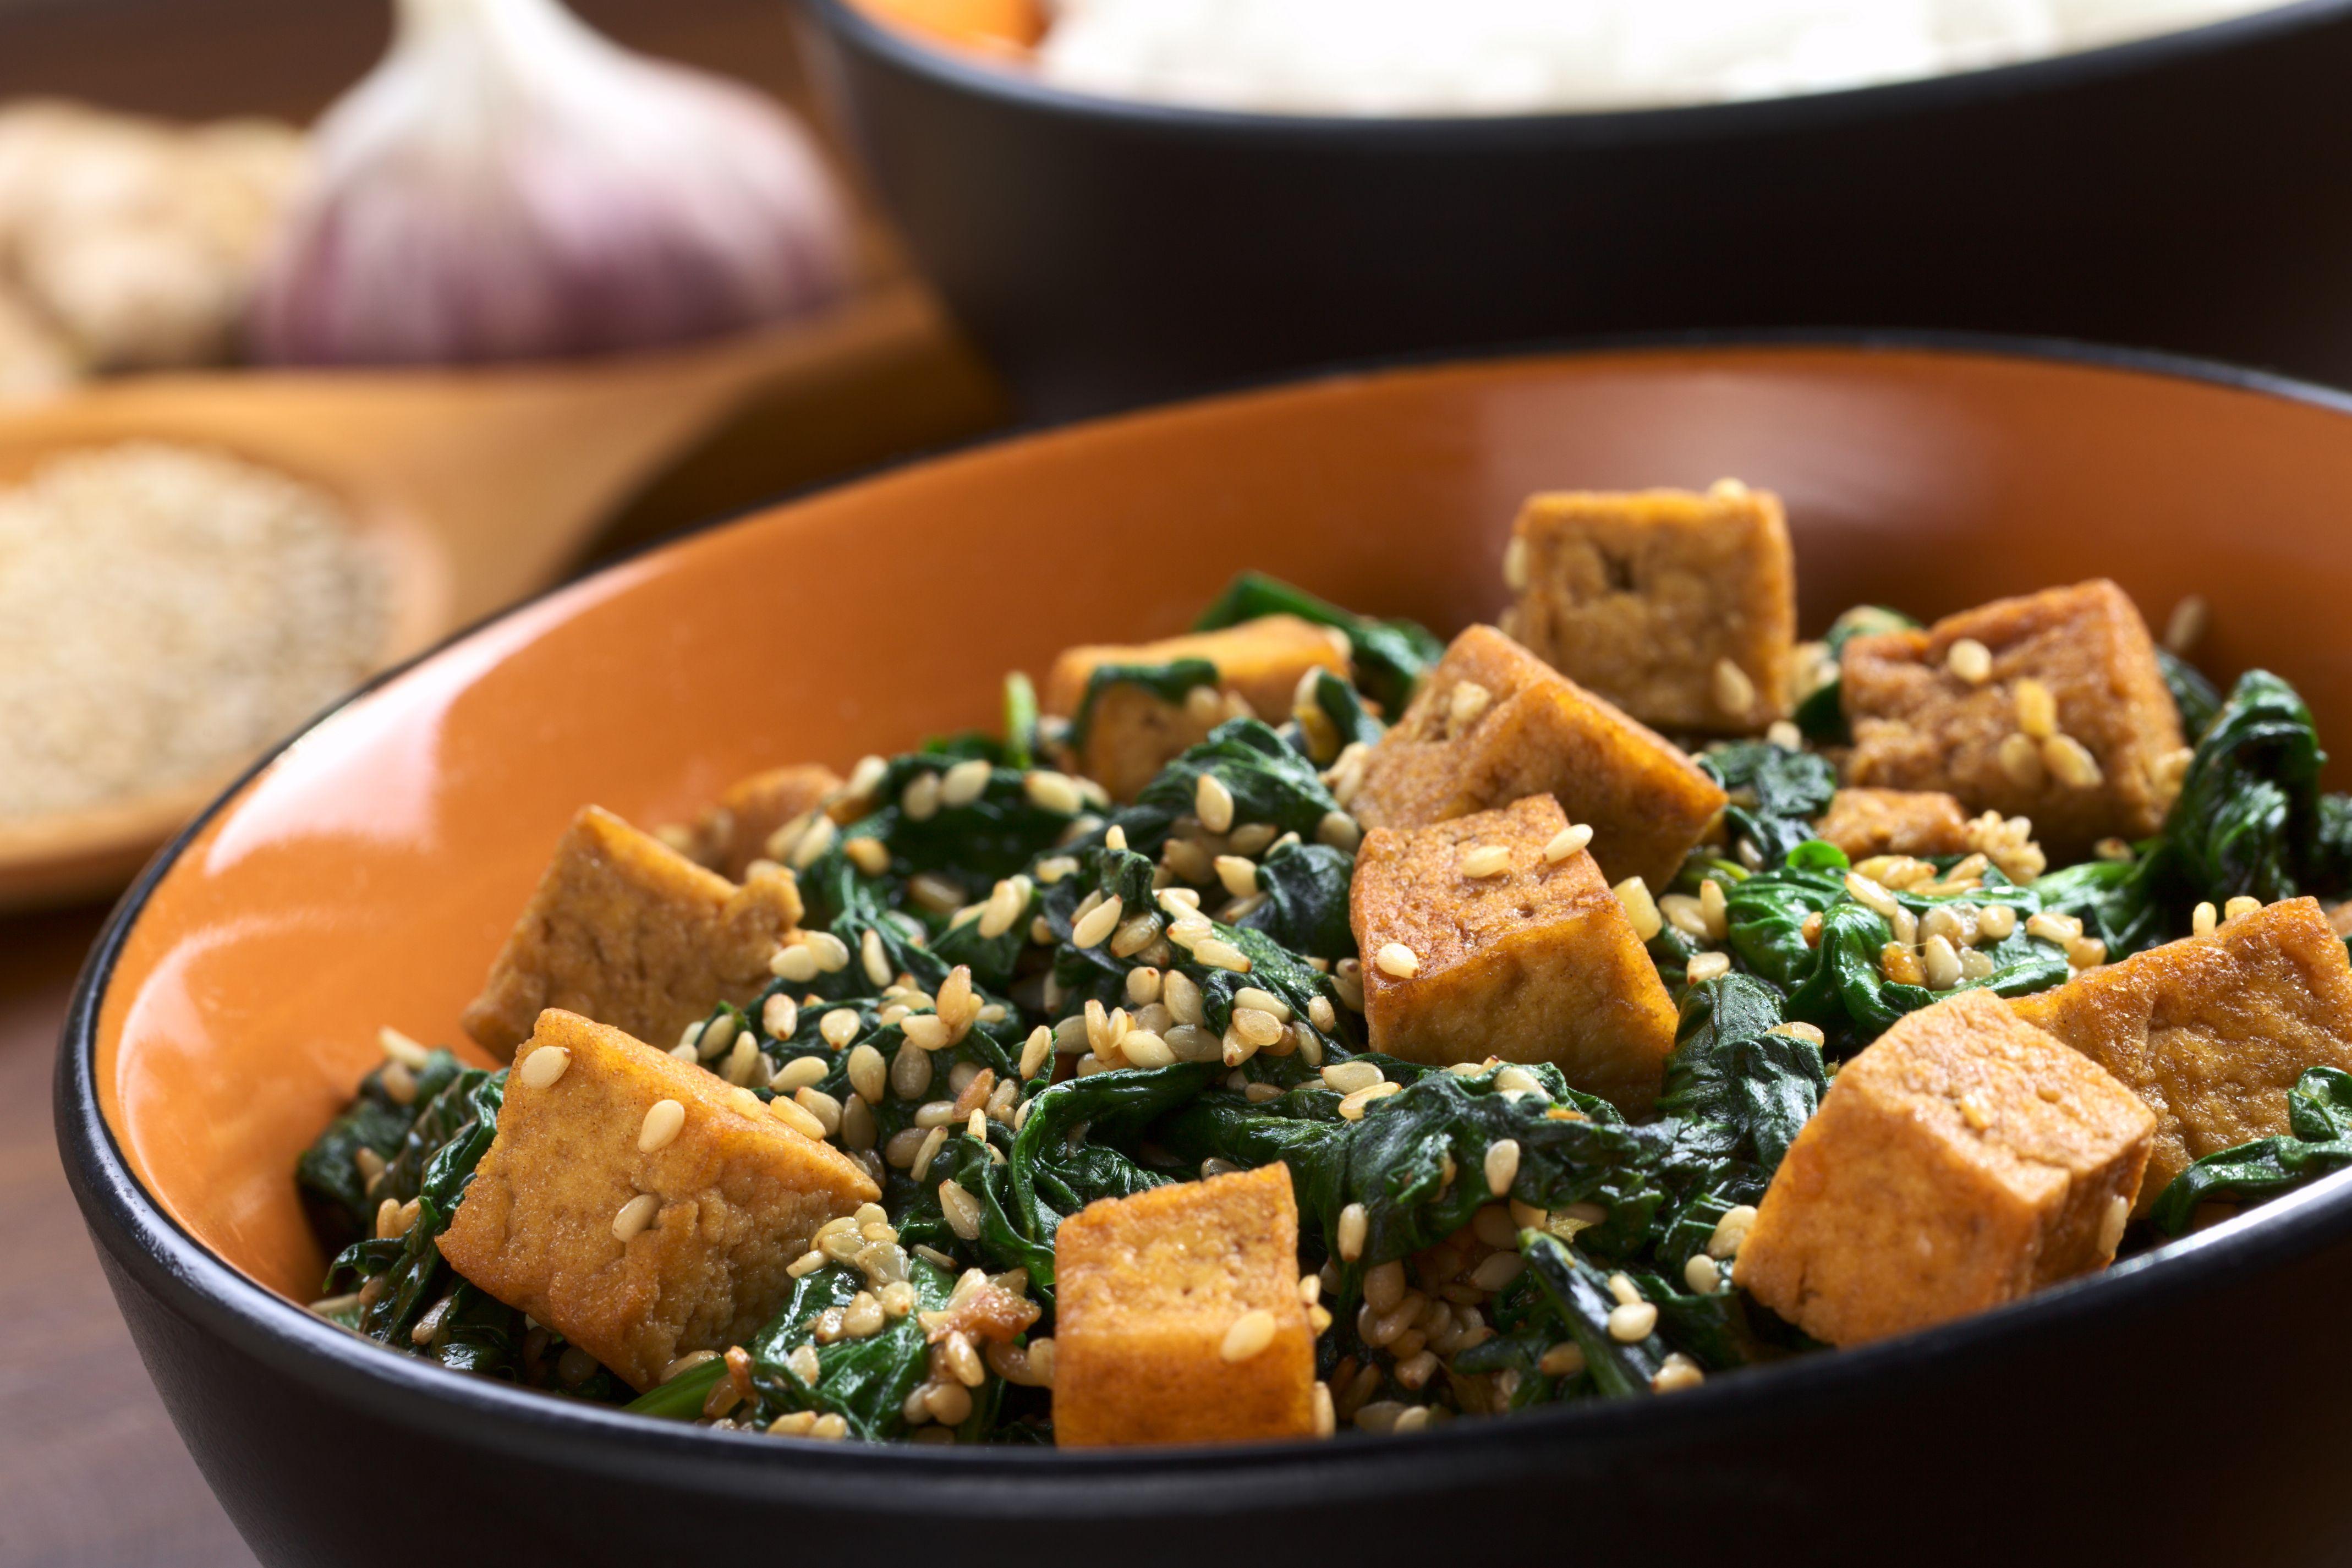 Tofu and spinach vegan dish.